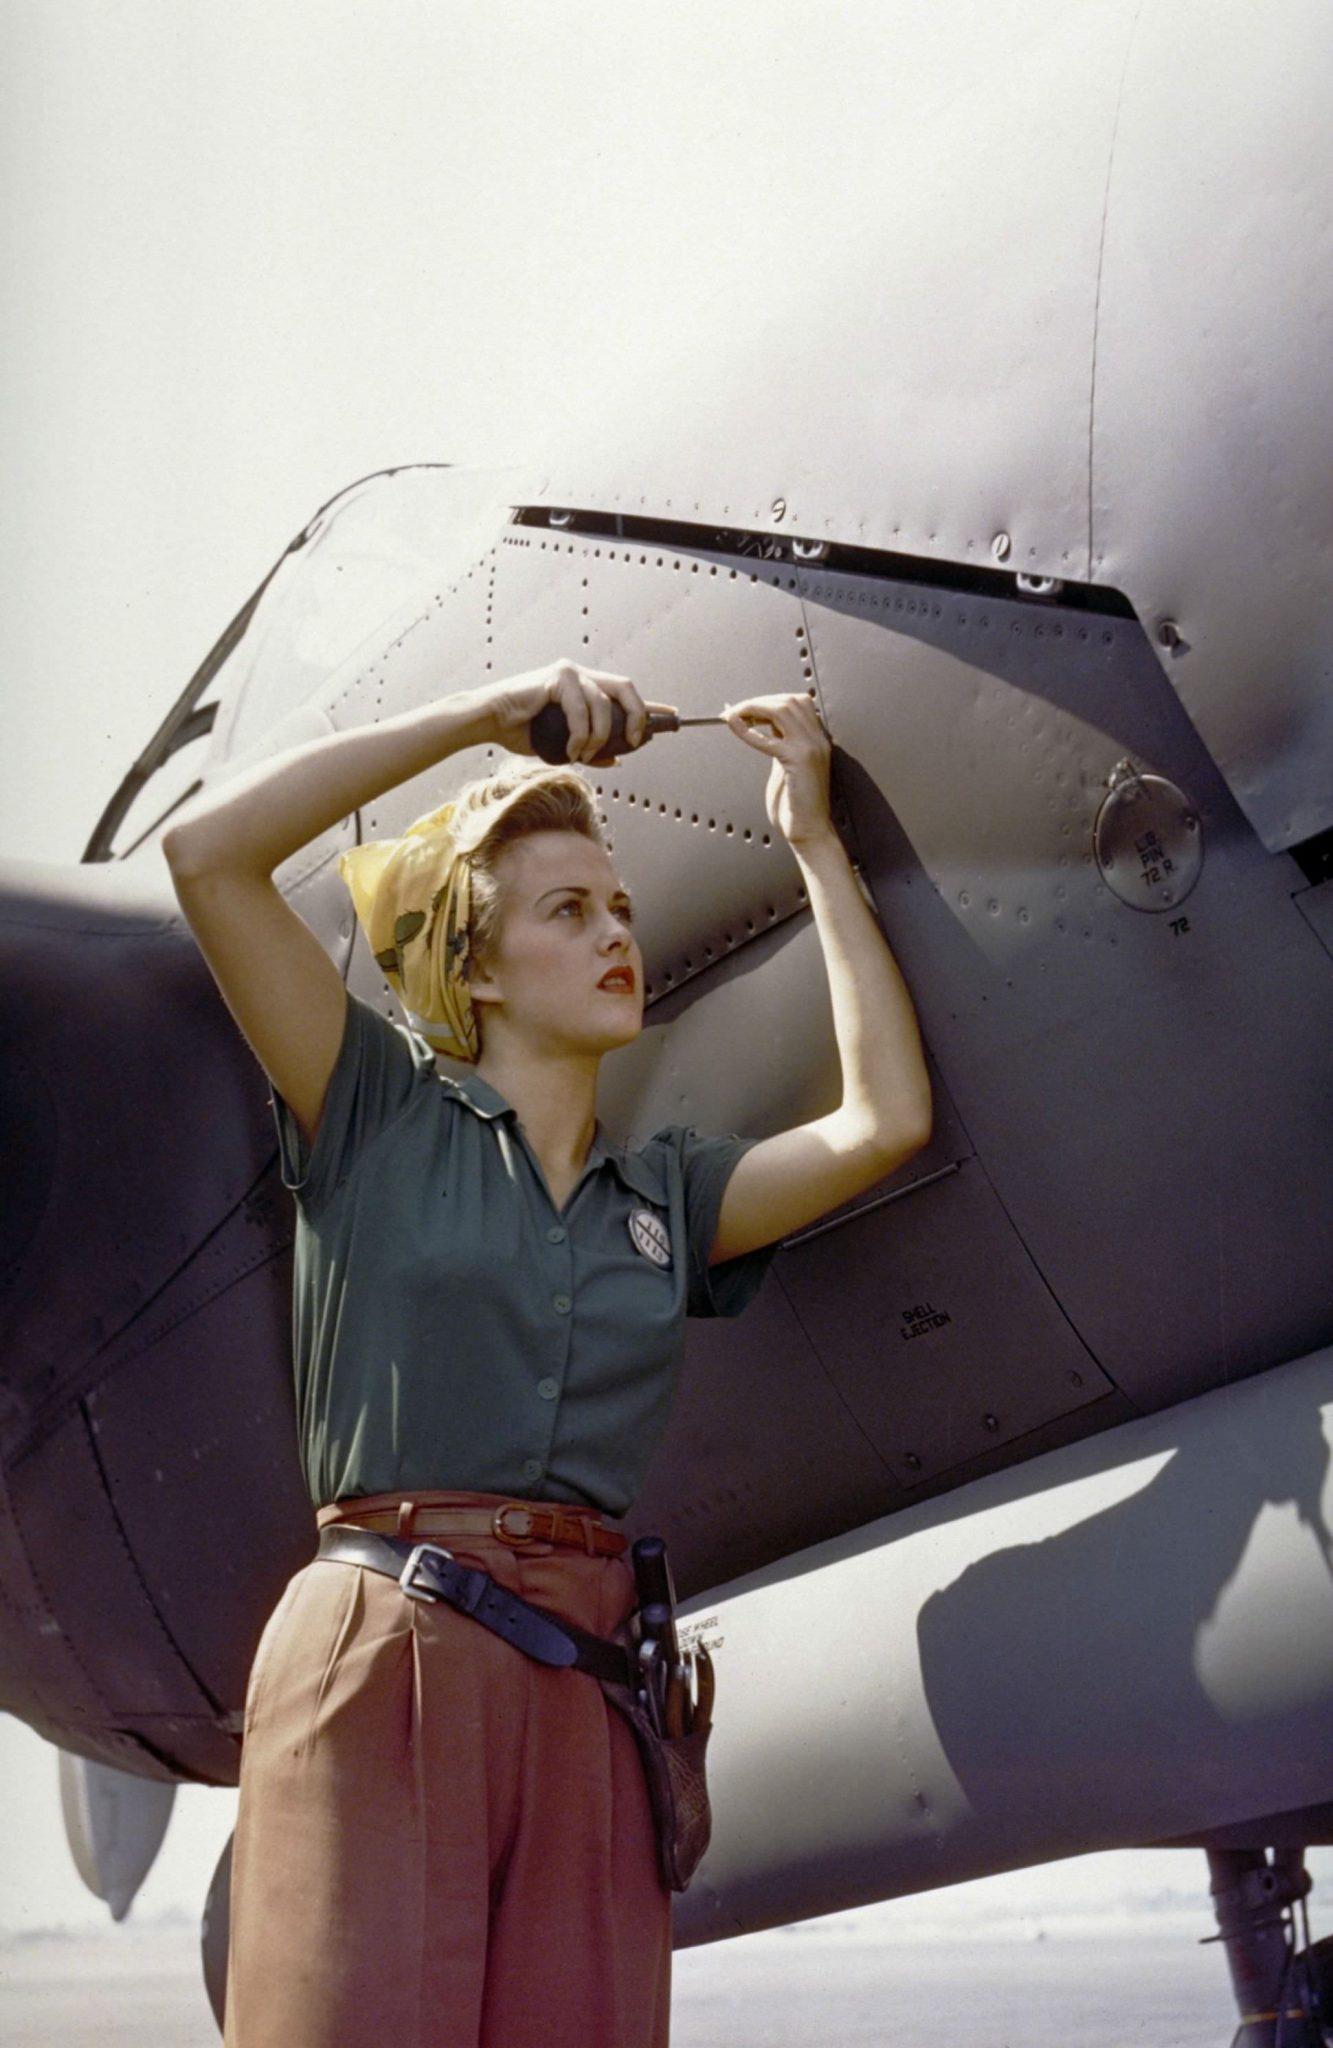 Female Lockheed employee working on a P-38 Lightning, Burbank, California, 1944